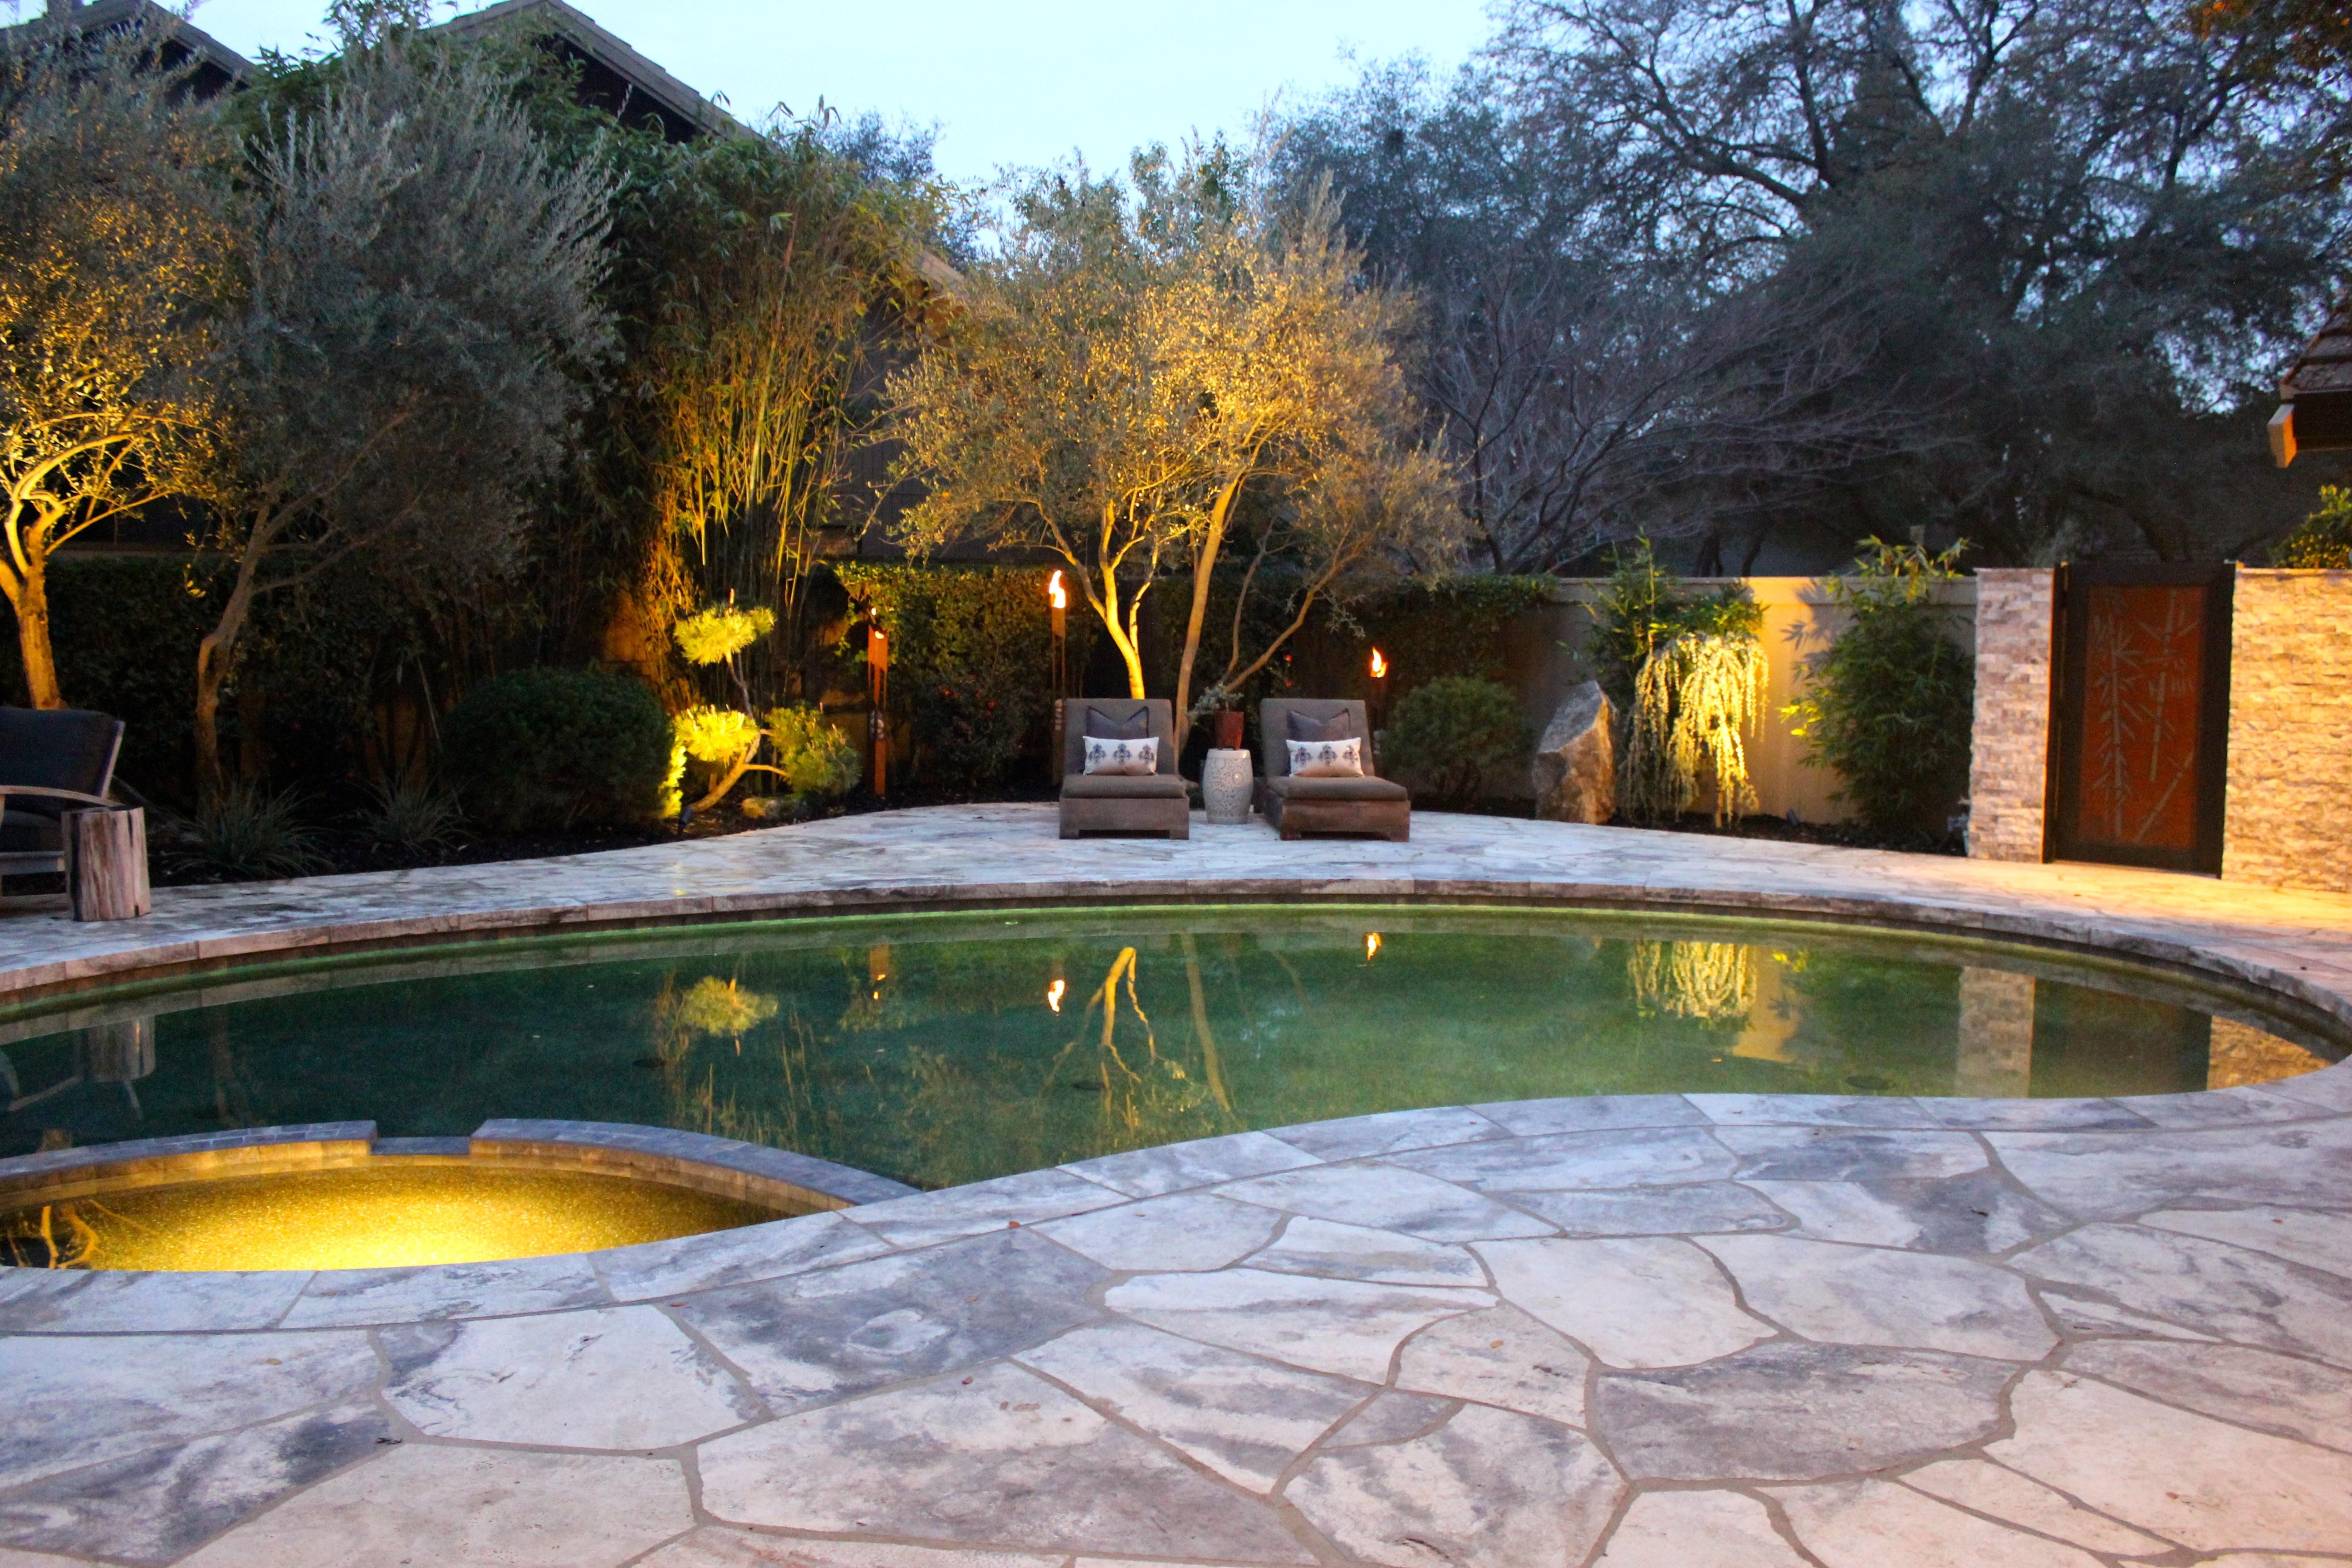 Asian Inspired Pool Amp Backyard Environment Michael